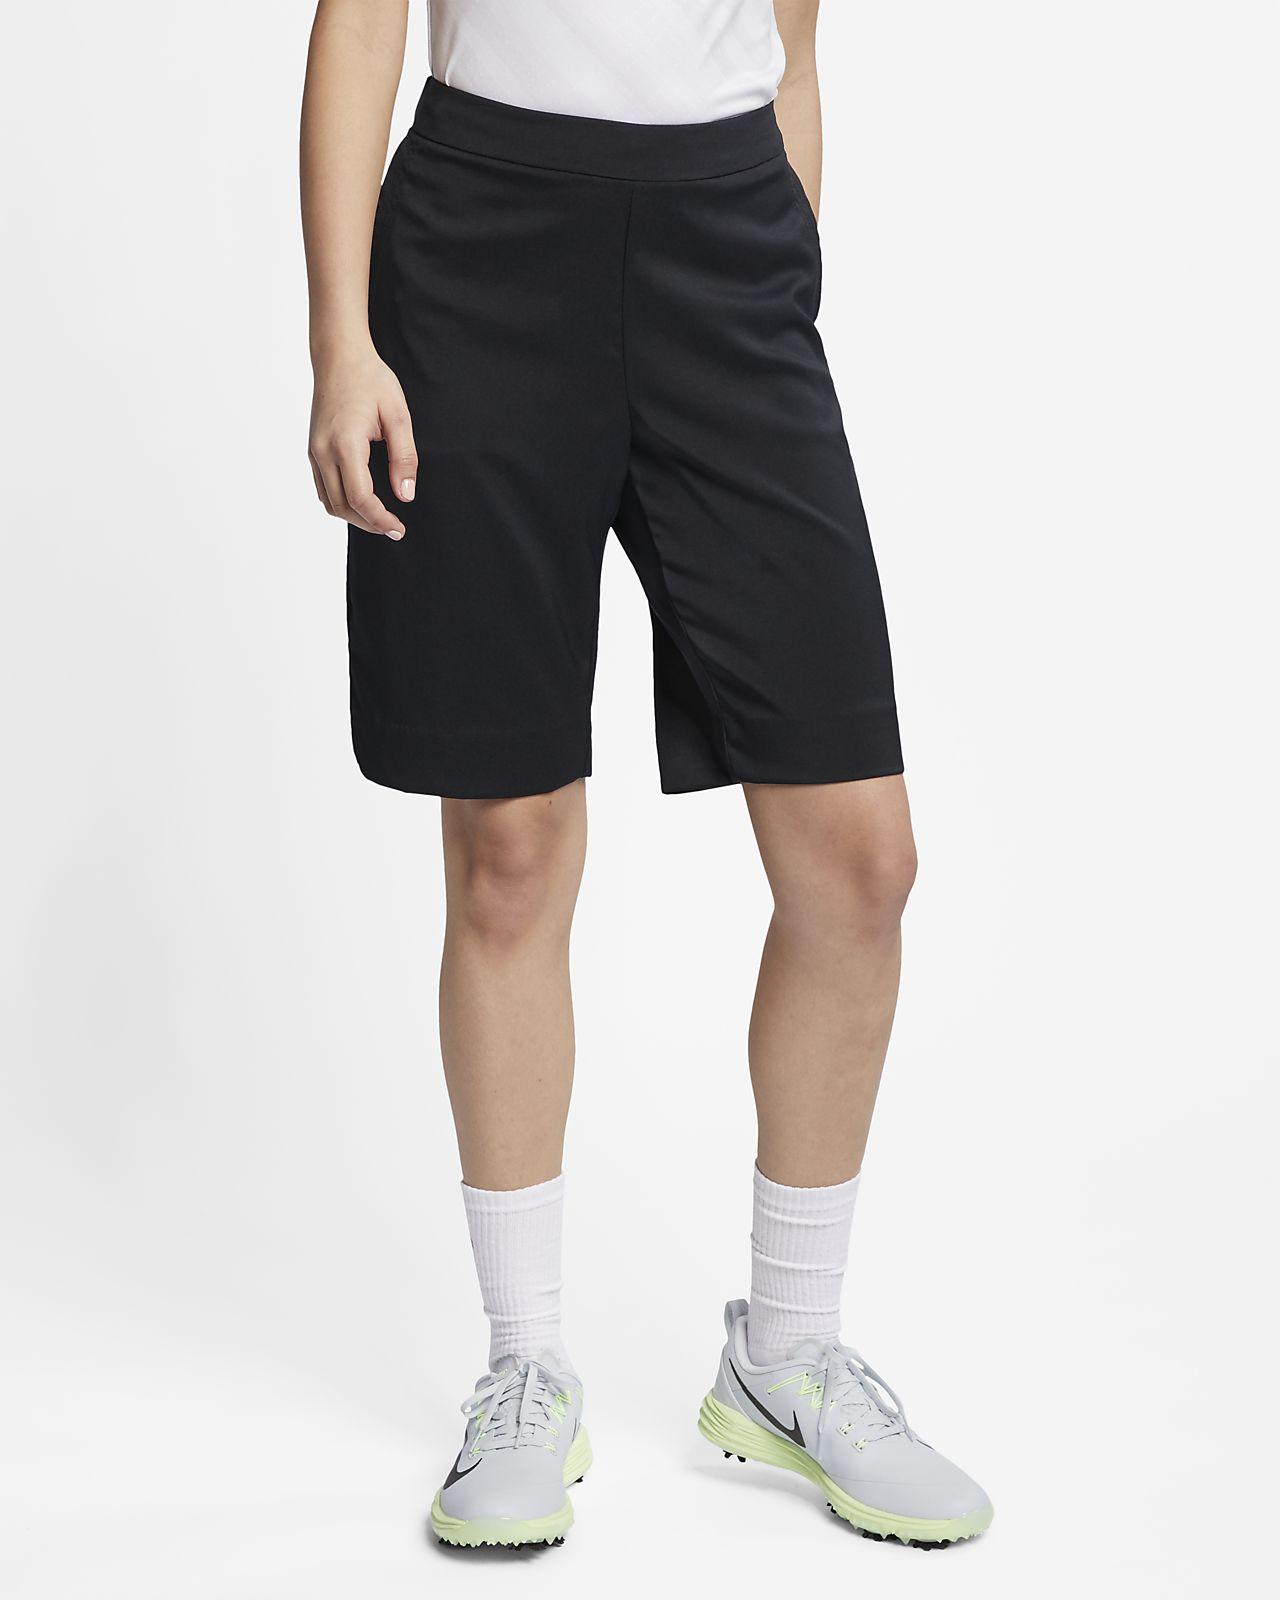 Nike Dri-FIT UV golfshorts til dame (28 cm)